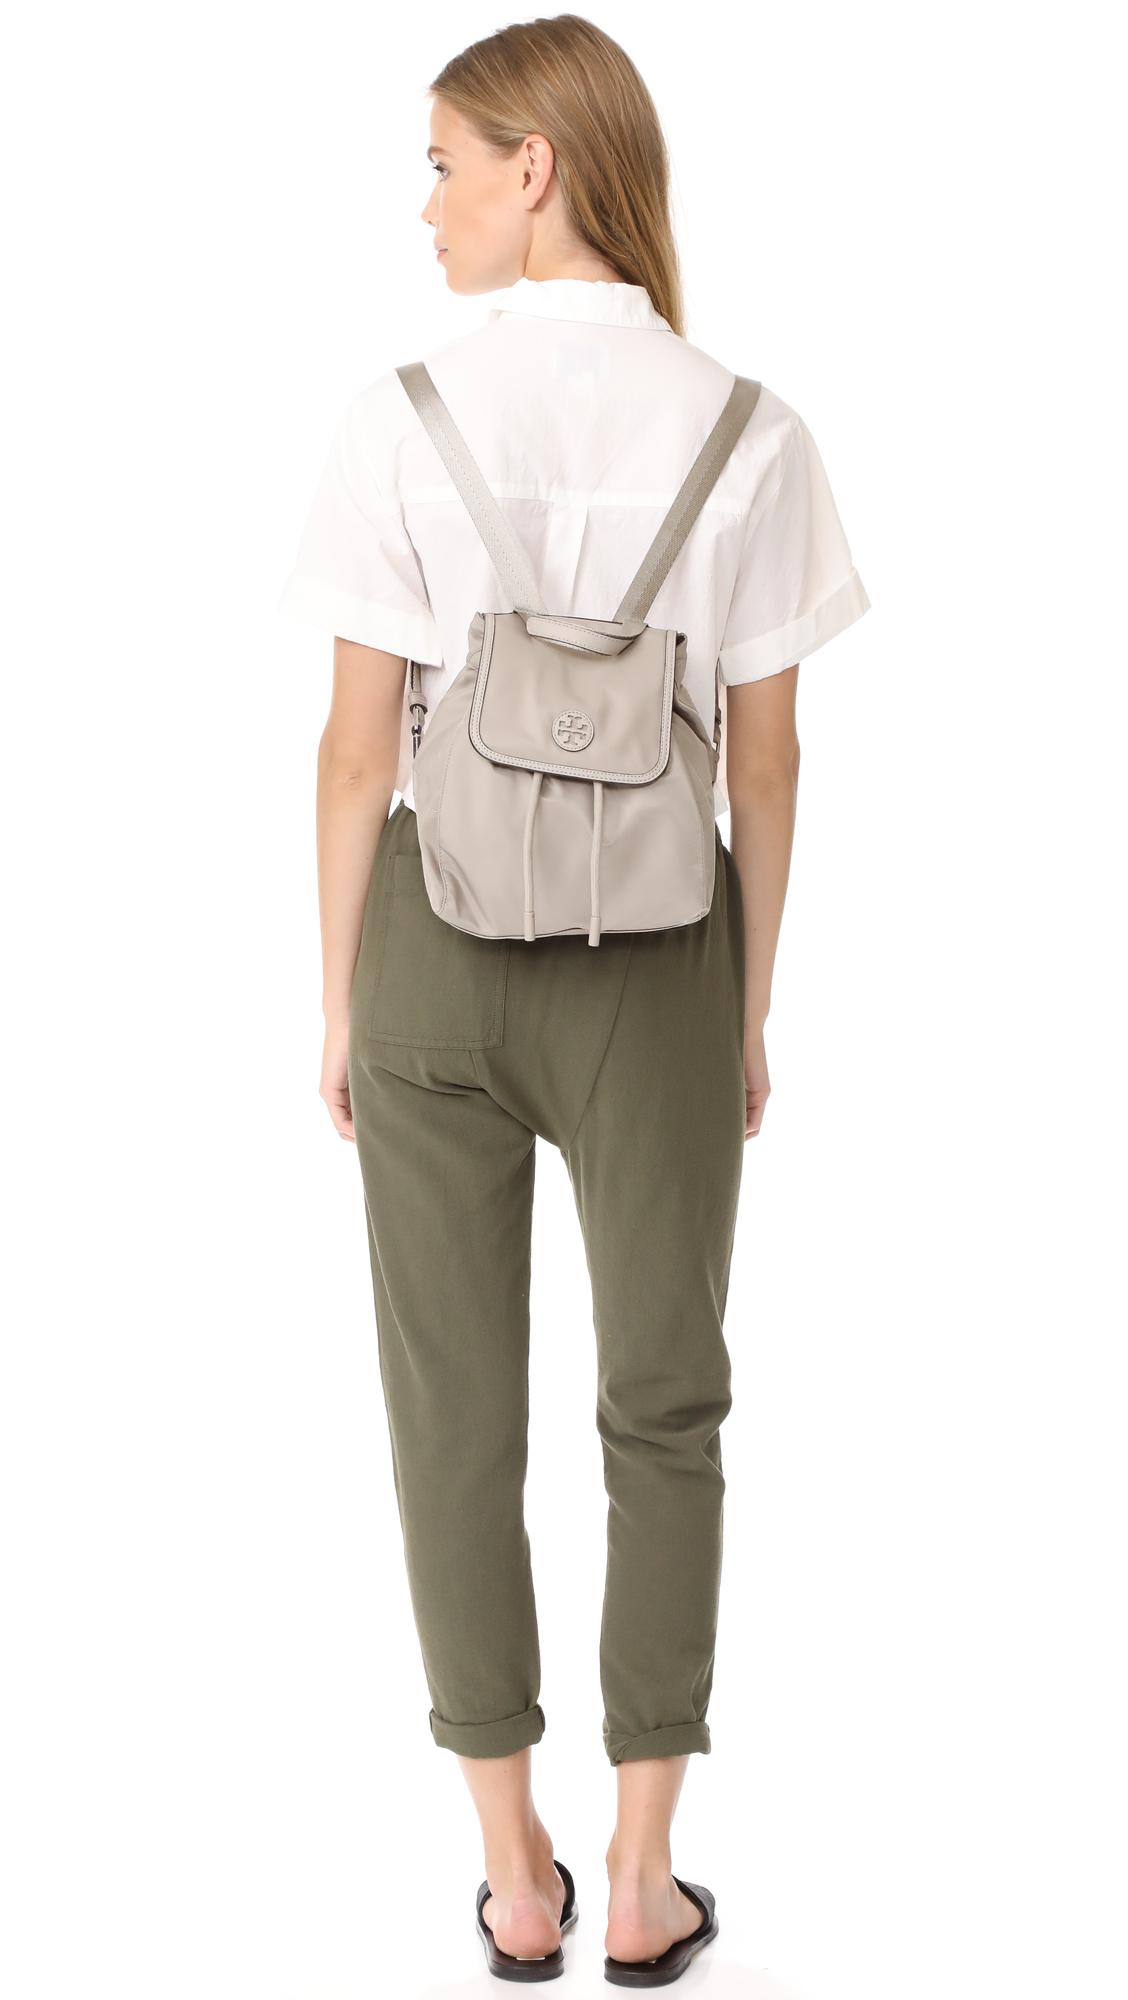 b030c85bb2a Tory Burch Scout Nylon Small Backpack